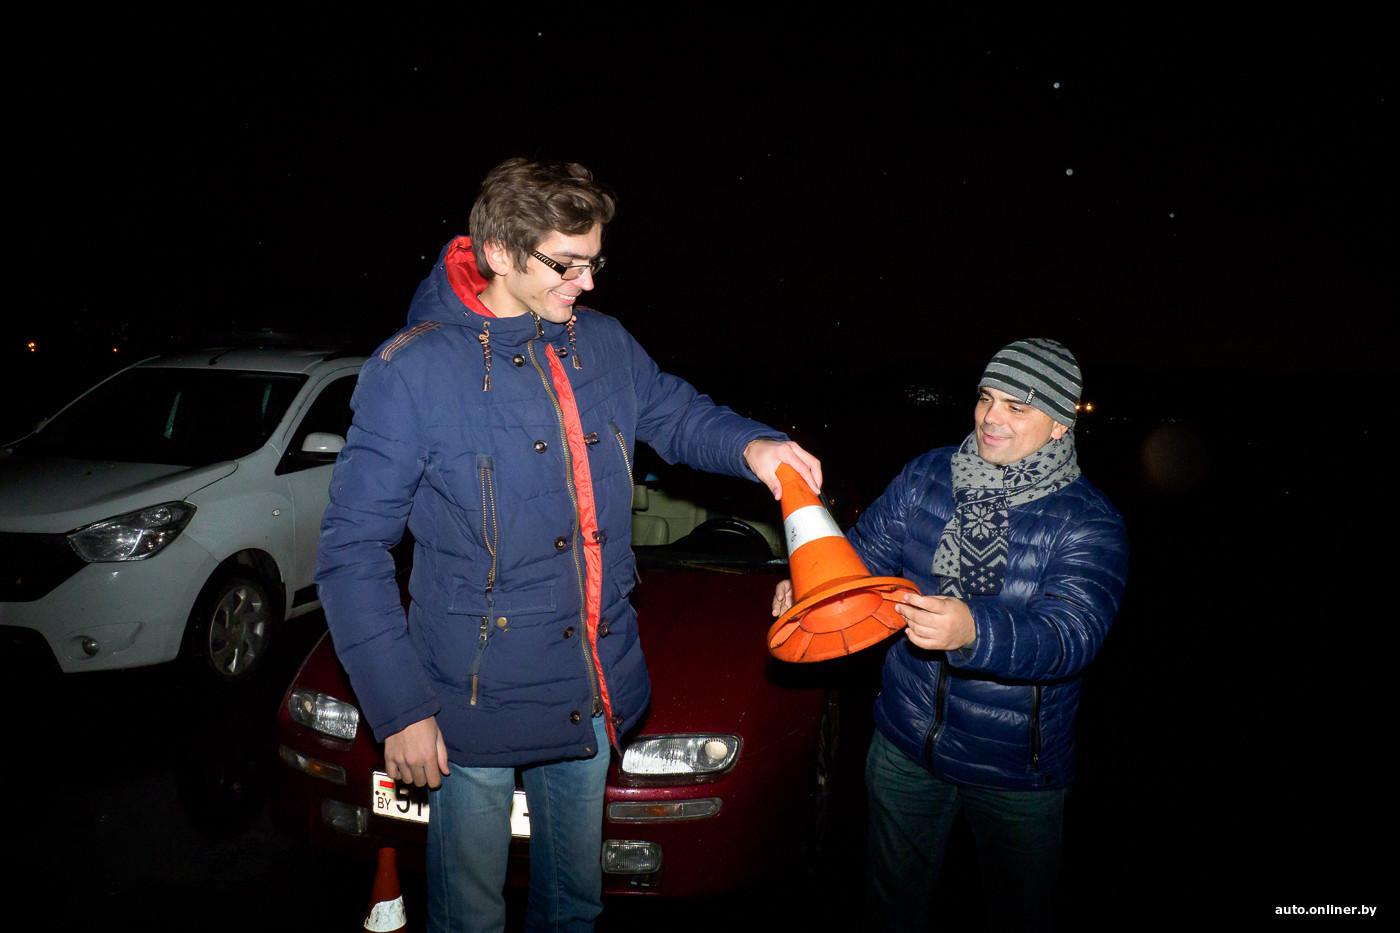 Спасал пешеходов или себя? Разбор ситуации в Гродно и тренировка на распознавание опасности